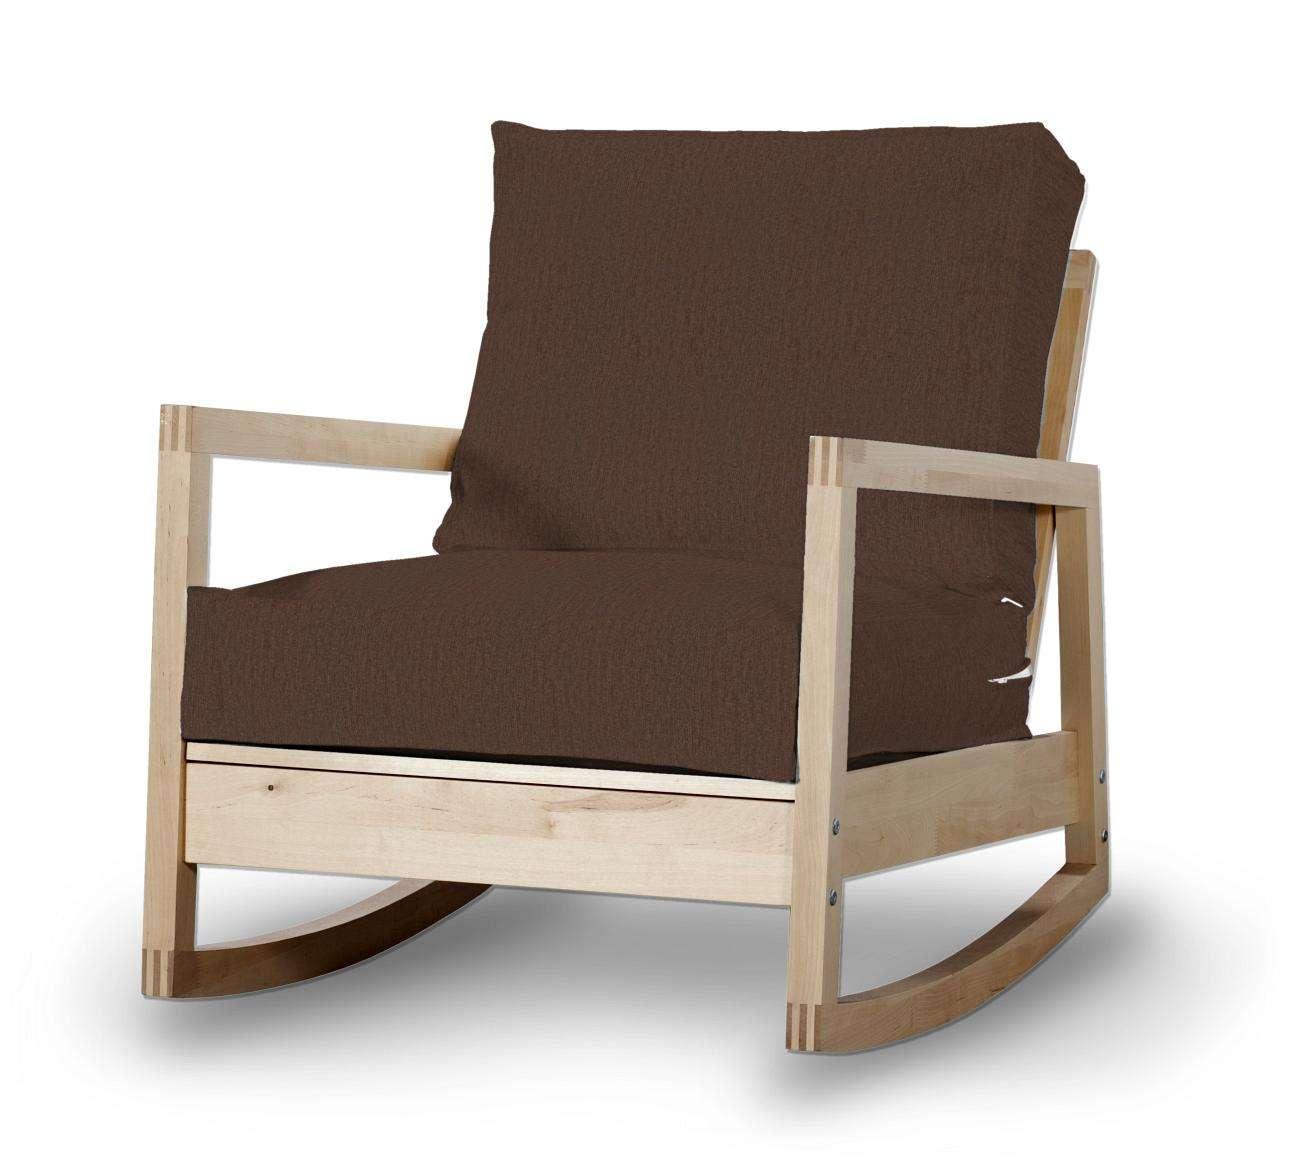 Pokrowiec na fotel Lillberg w kolekcji Chenille, tkanina: 702-18